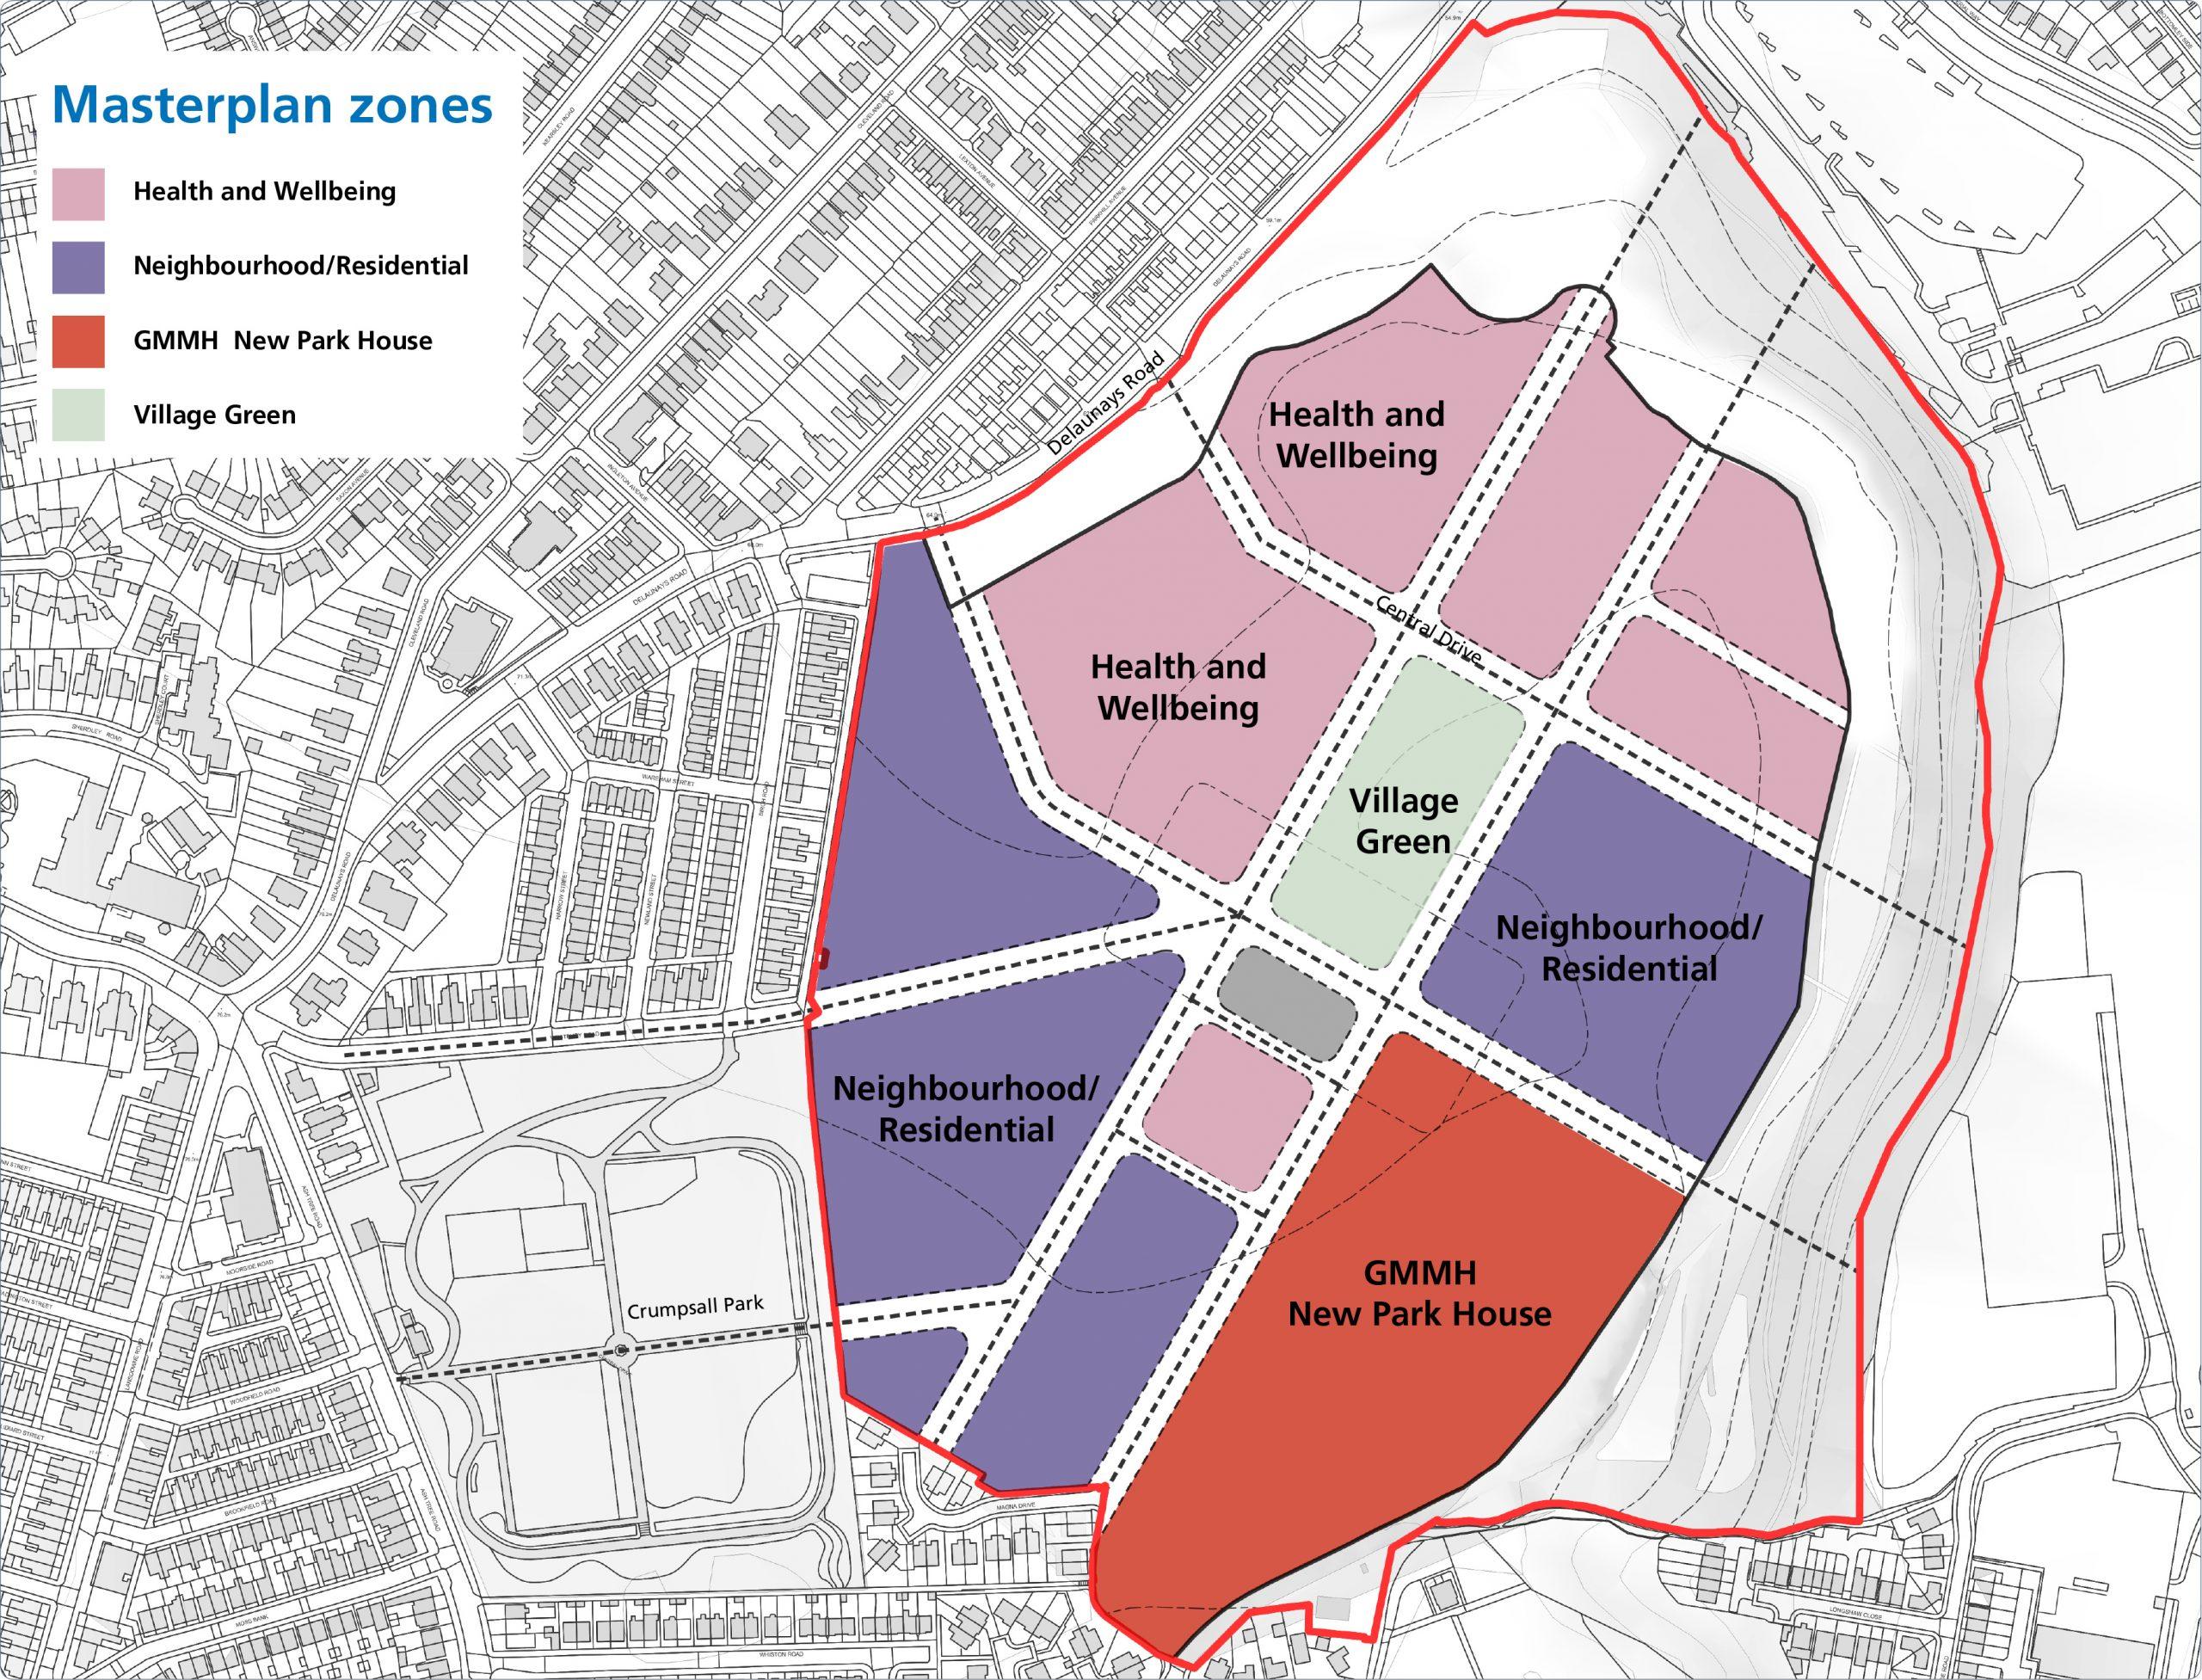 North Manchester Hospital Masterplan Zones